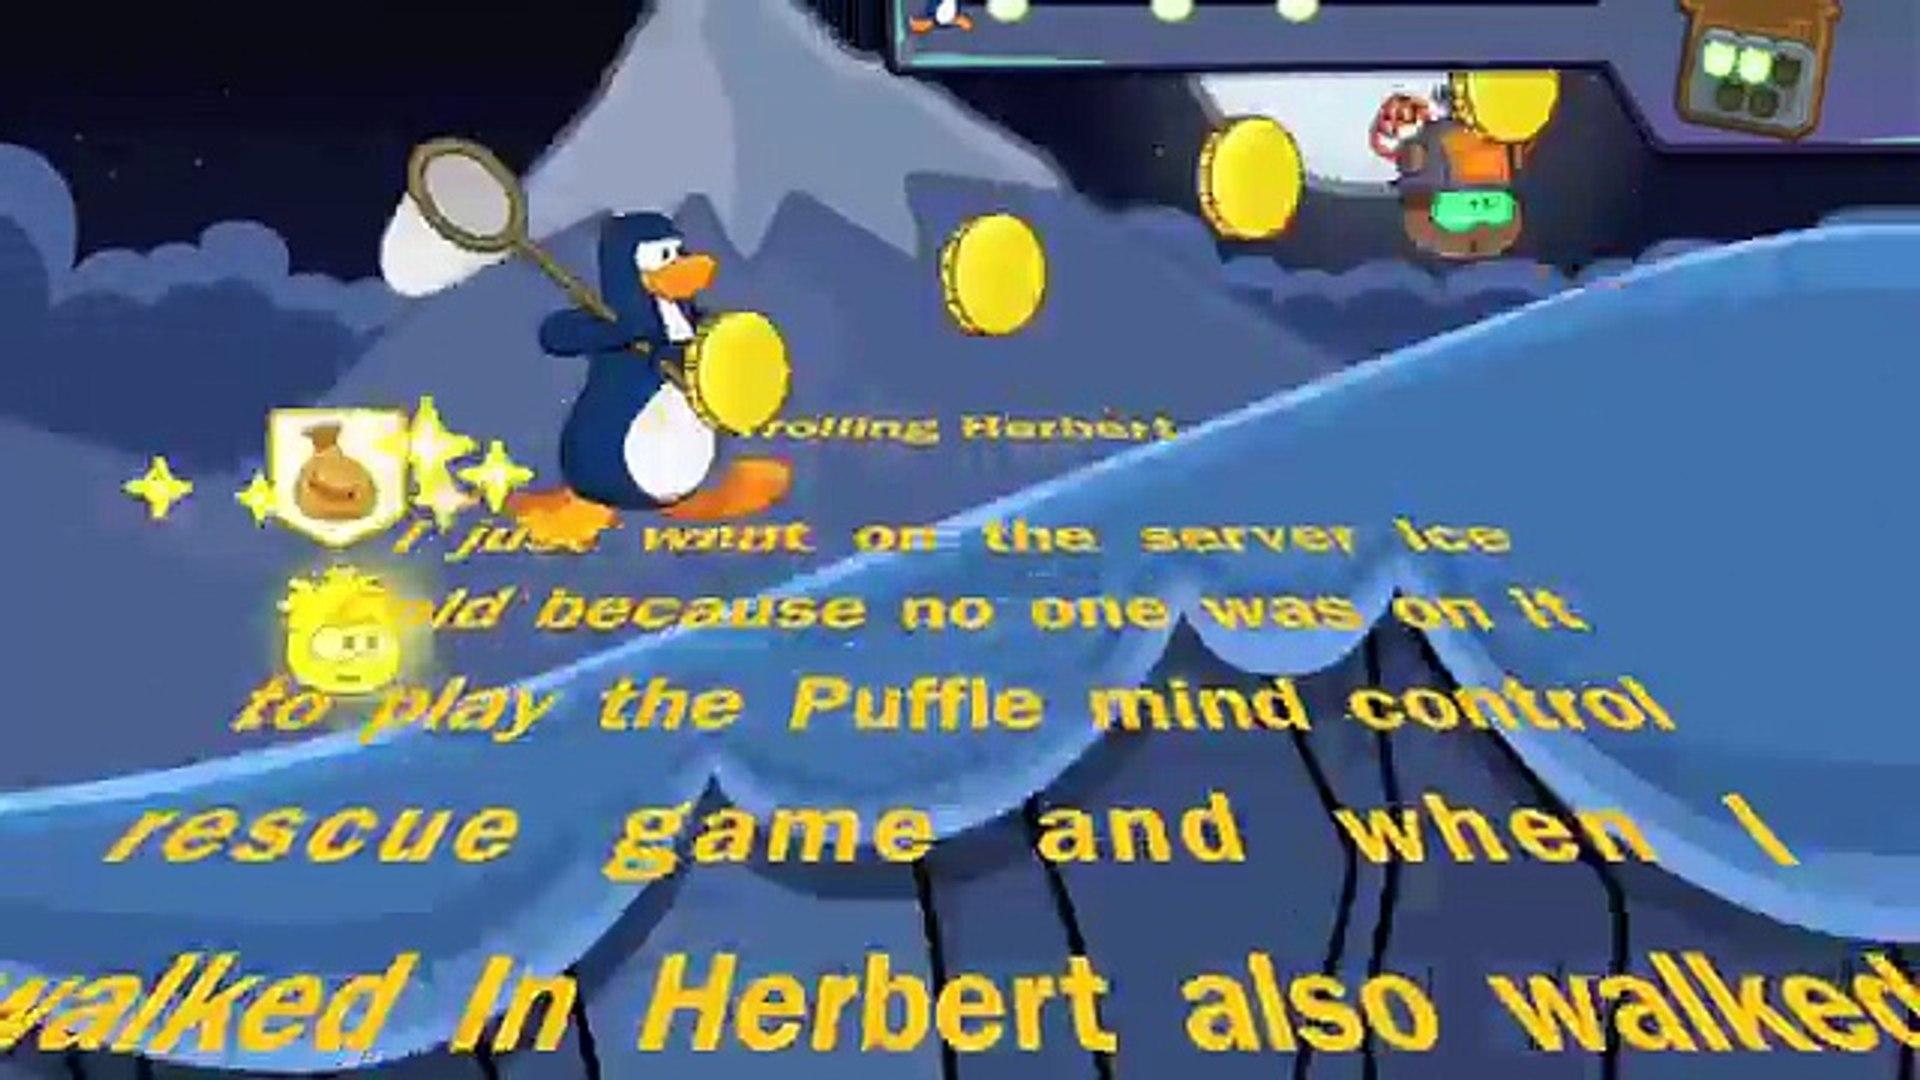 Club Penguin Trolling Herbert